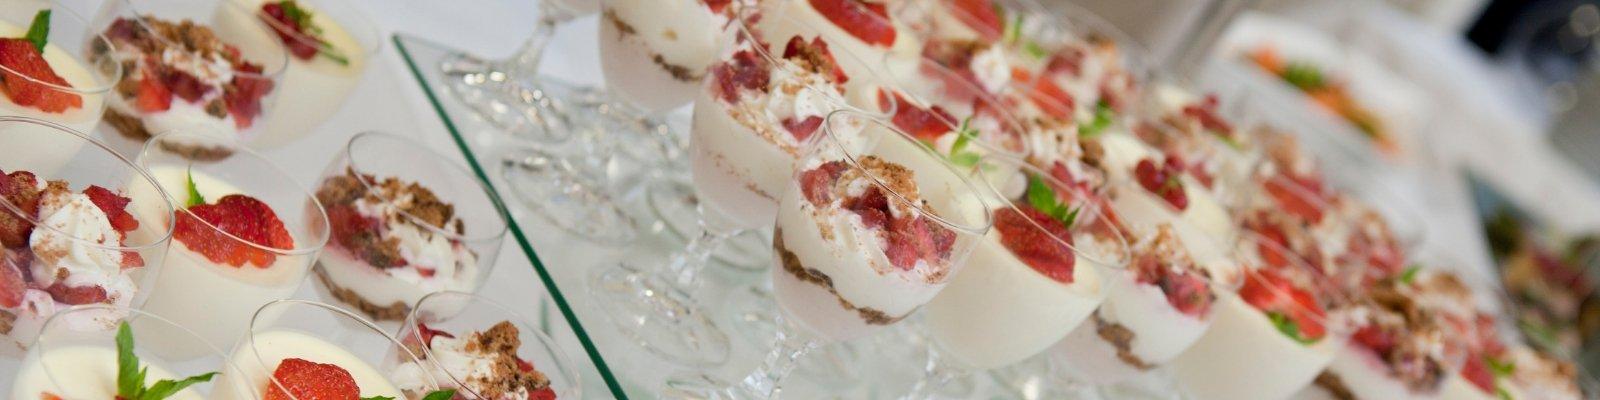 fresh & joy events- Dessert